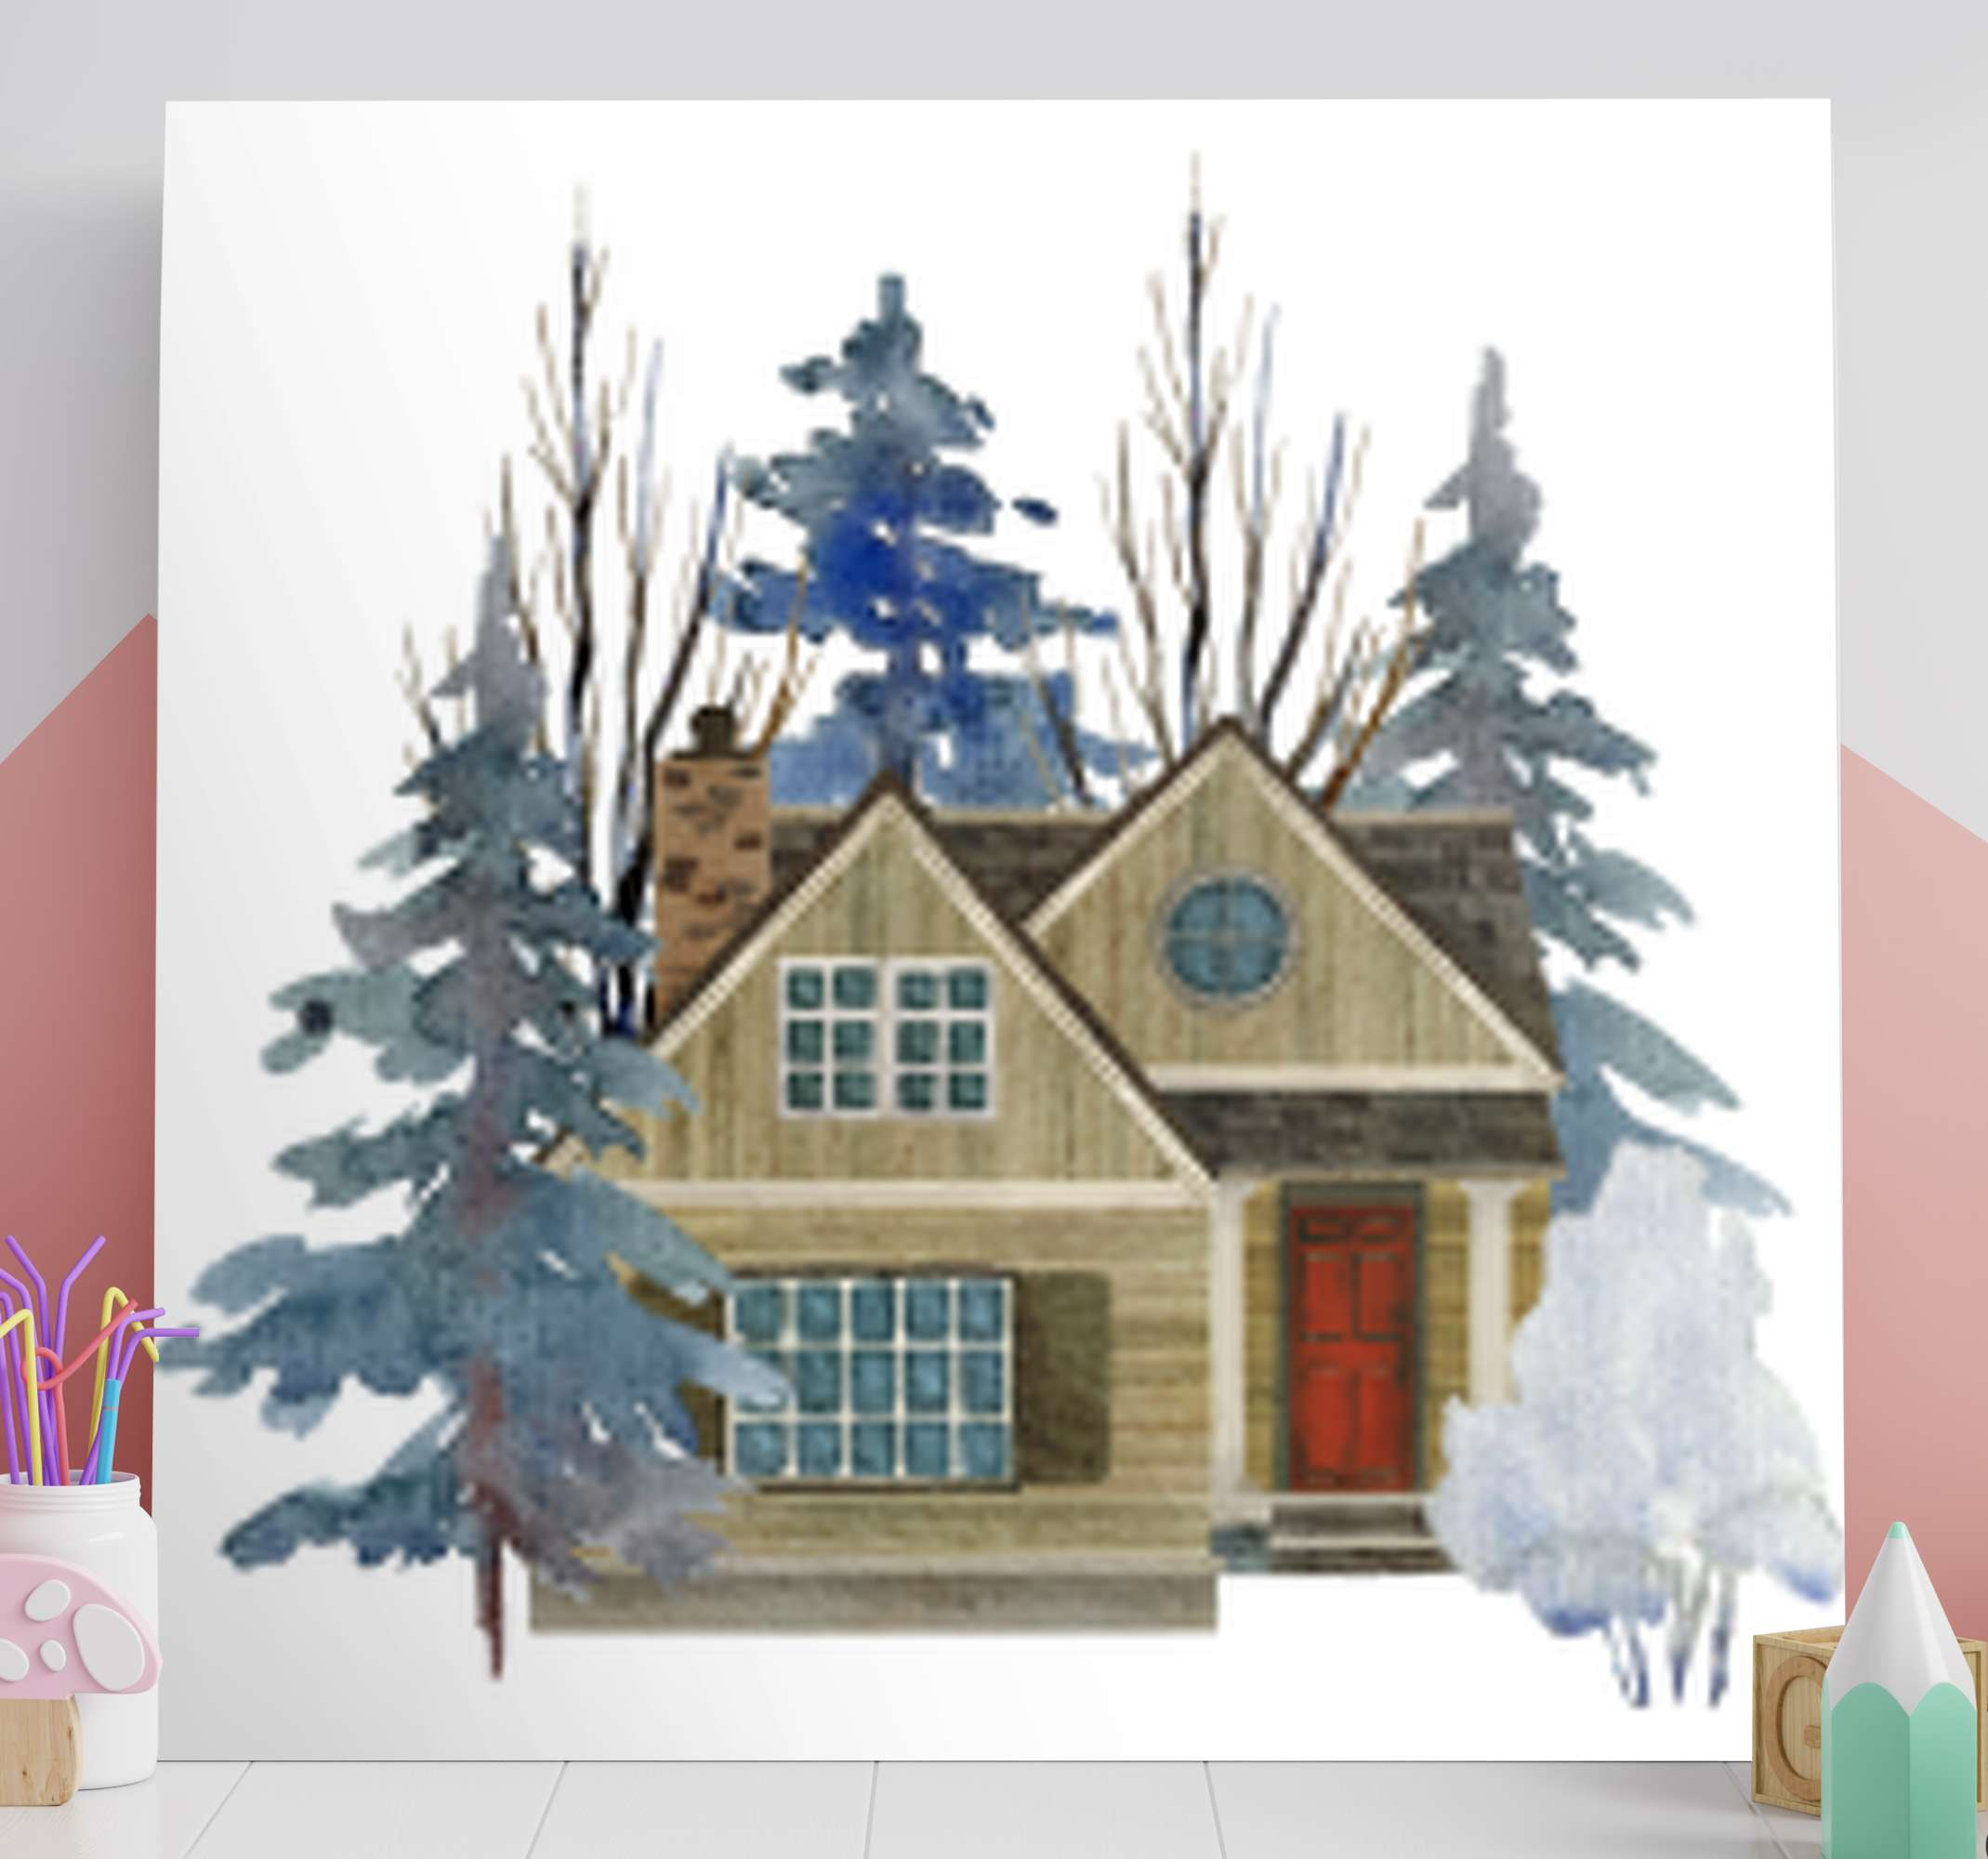 TenStickers. 乡村风格,乡村帆布墙艺术. 这个美丽的房子插图质朴的画布艺术适合装饰房子的任何部分。它可以放在客厅,卧室等地方。